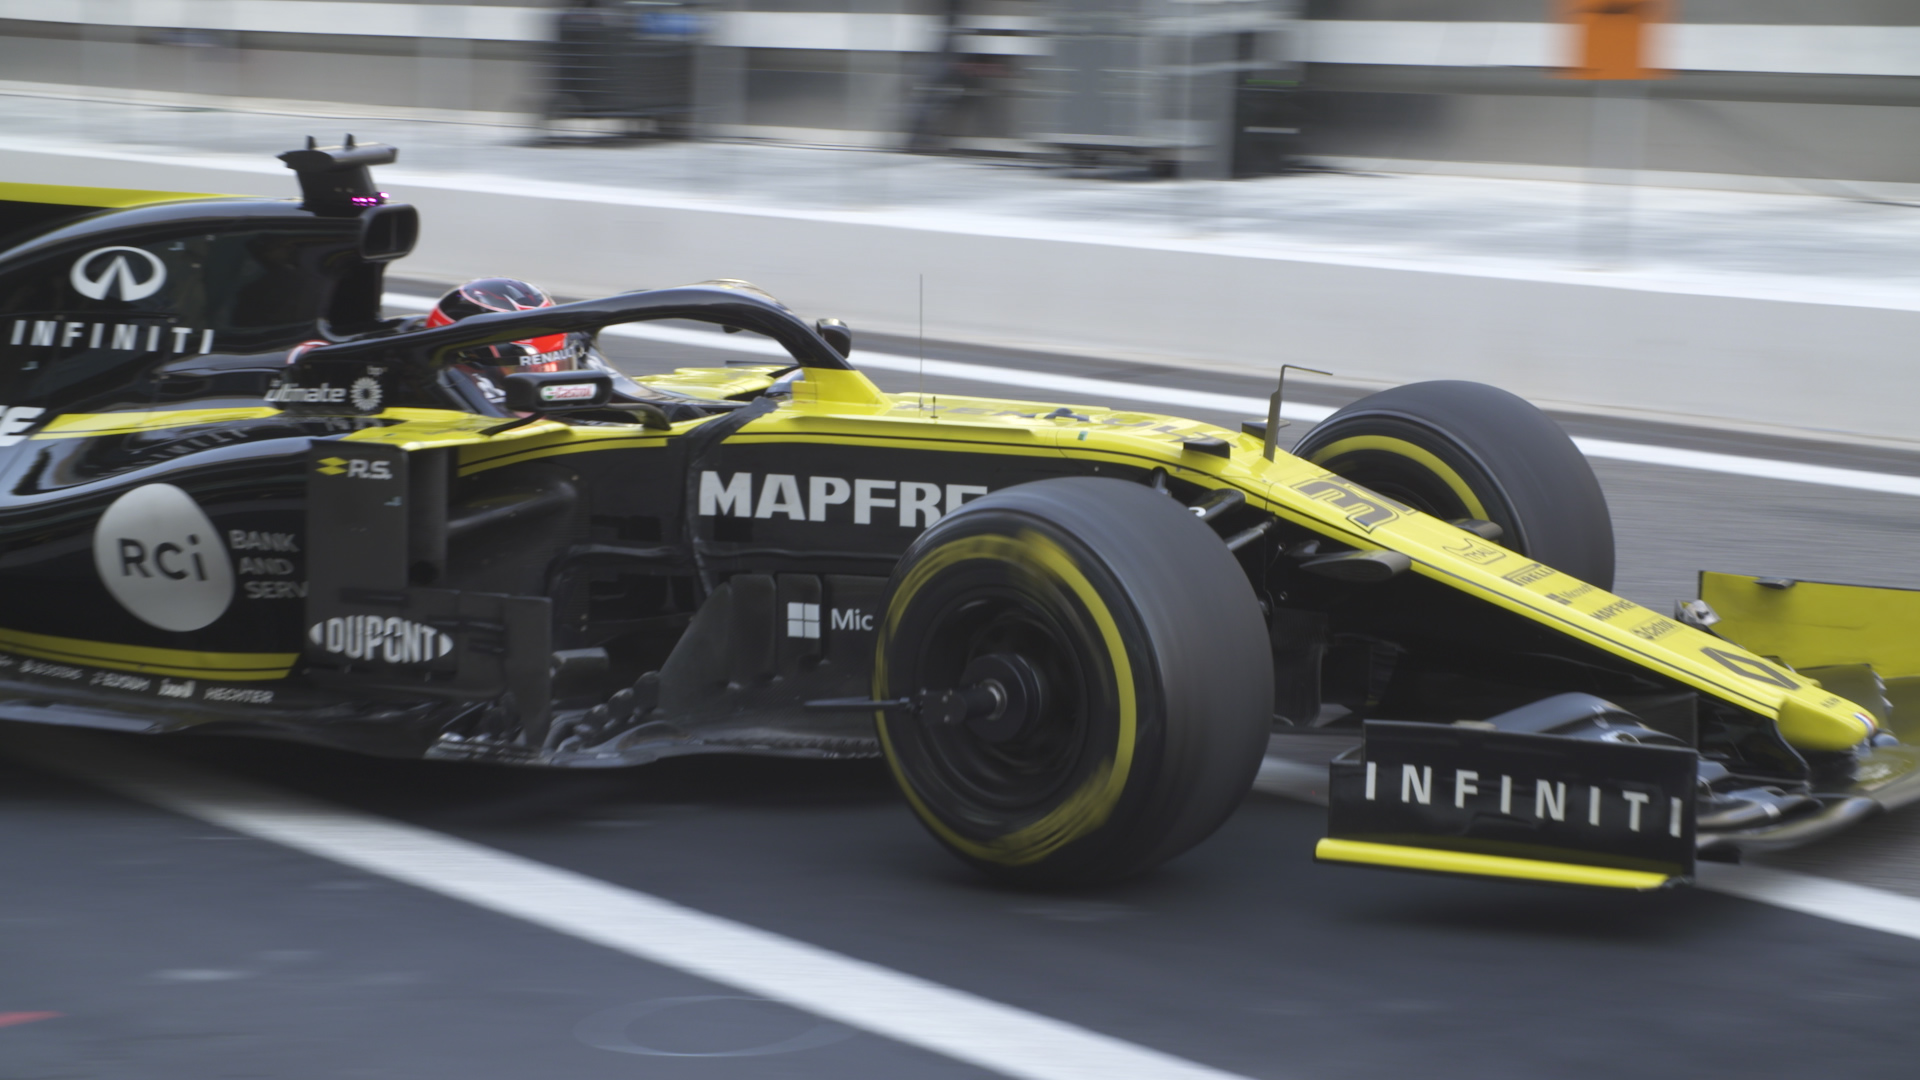 Esteban Ocon's F1 return with Renault